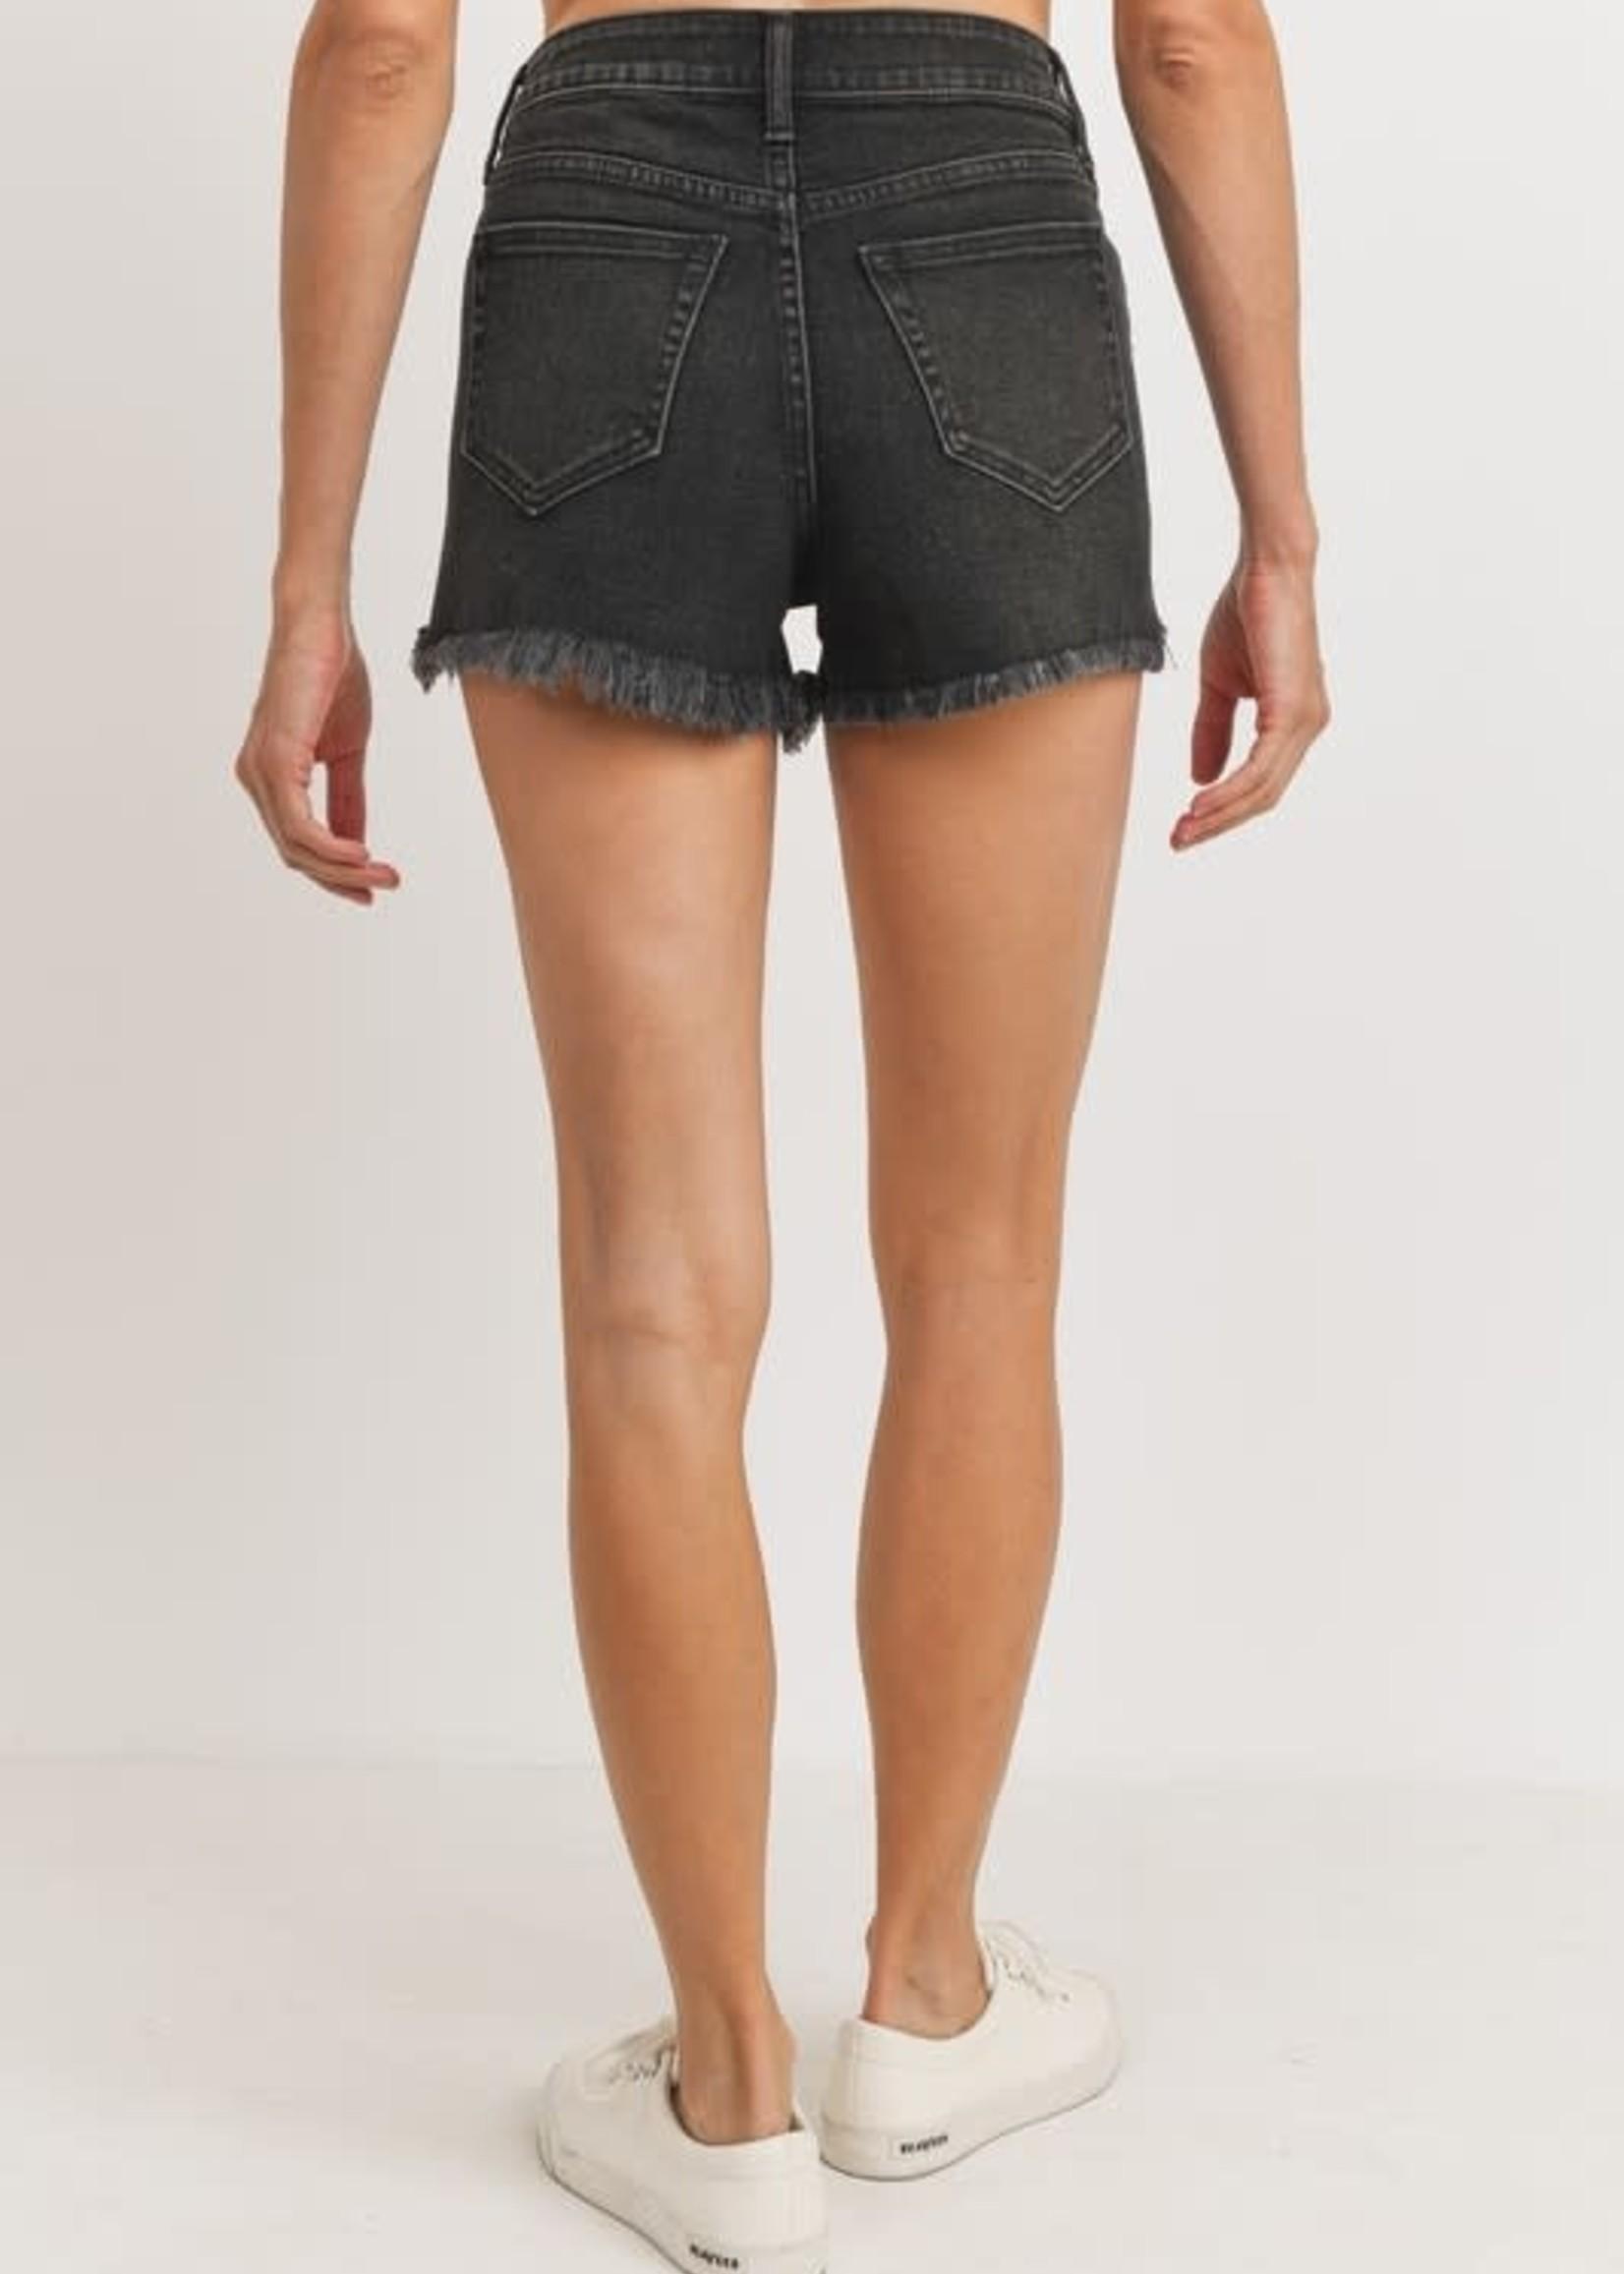 High Rise Hi-Lo Distressed Shorts - Washed Black